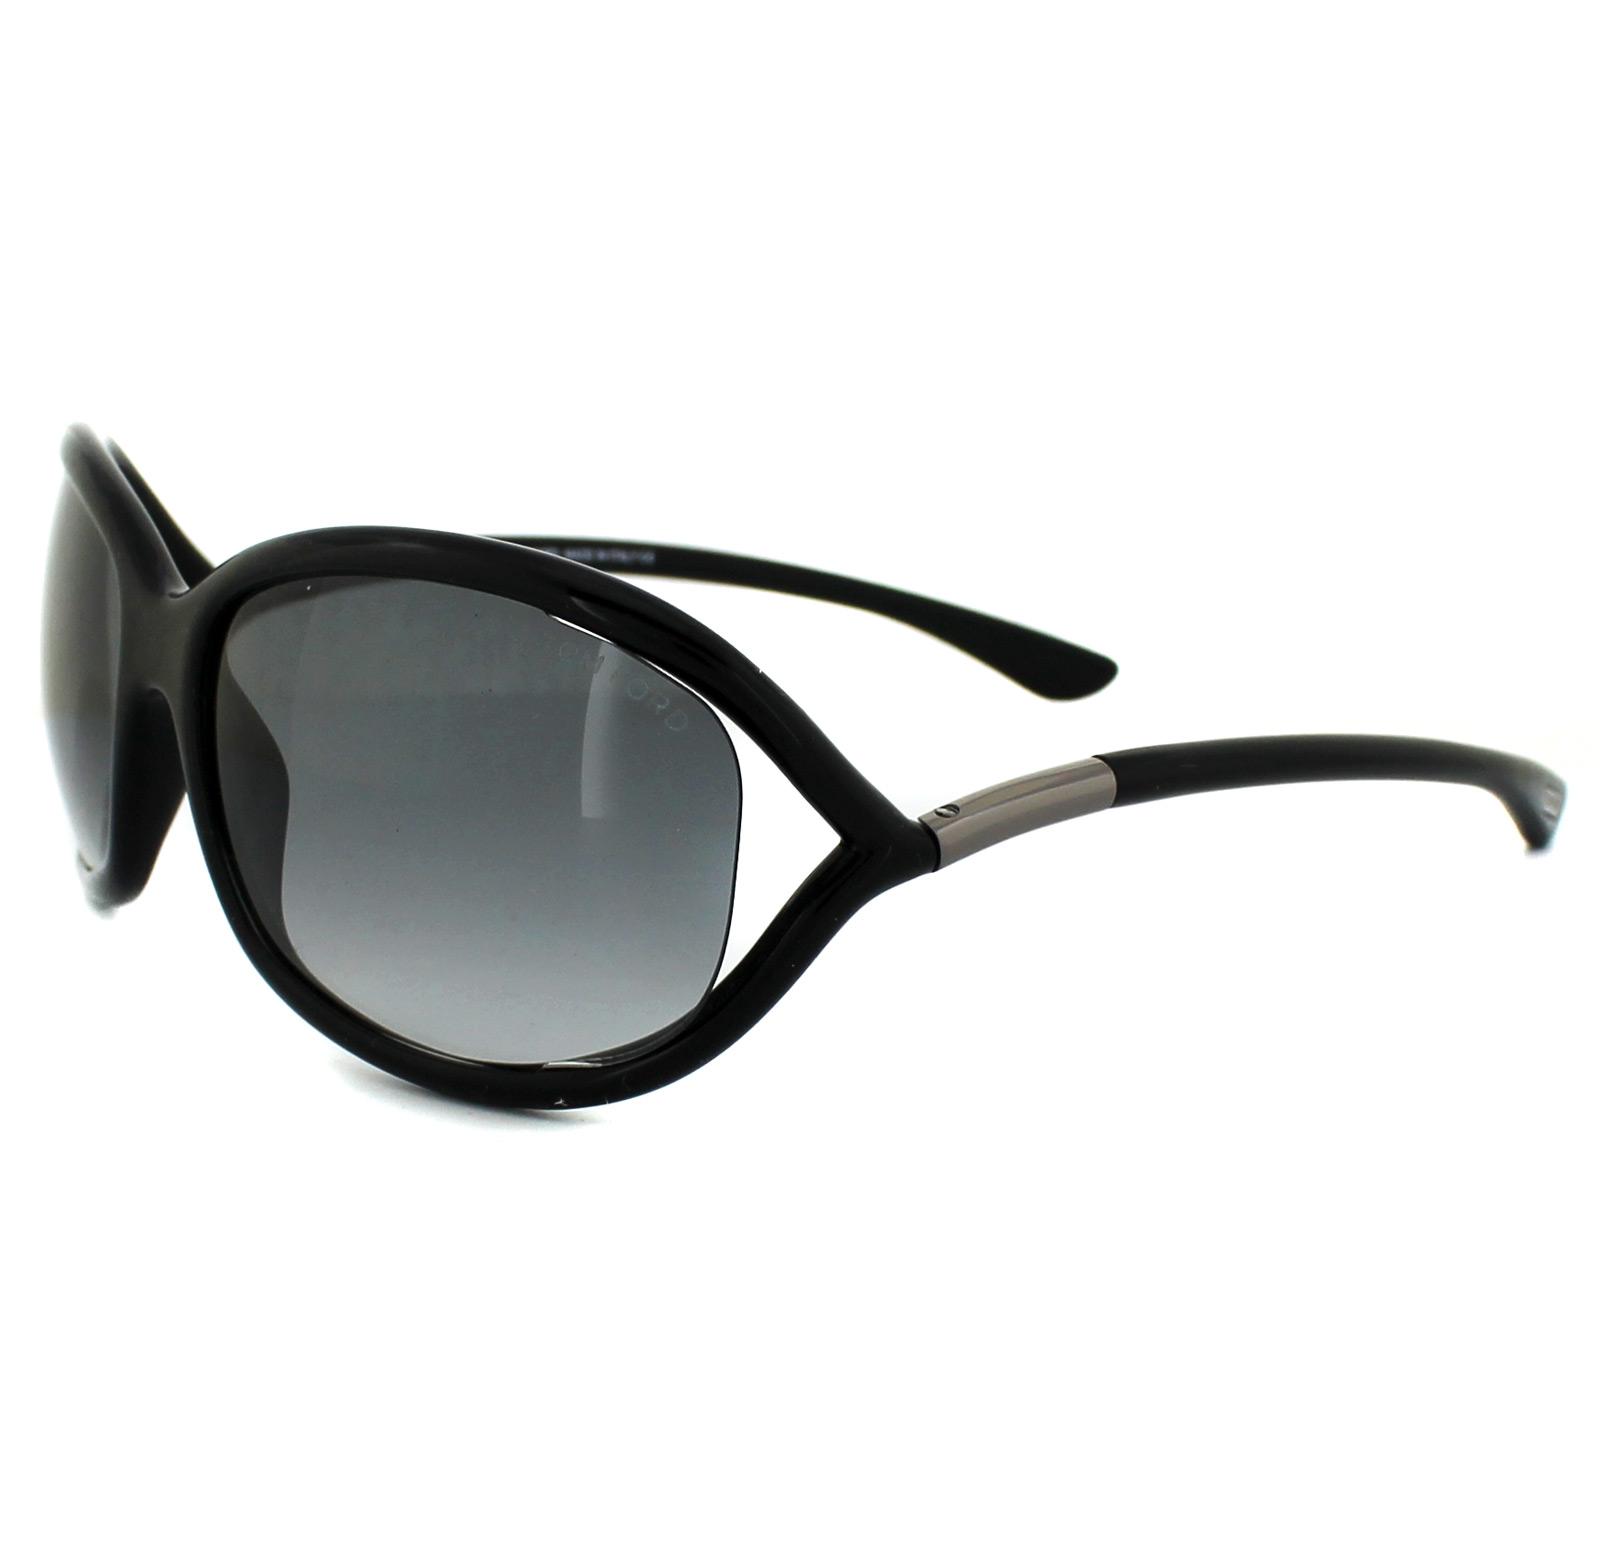 723a68d435a Tom Ford Sunglasses Ebay Uk « Heritage Malta